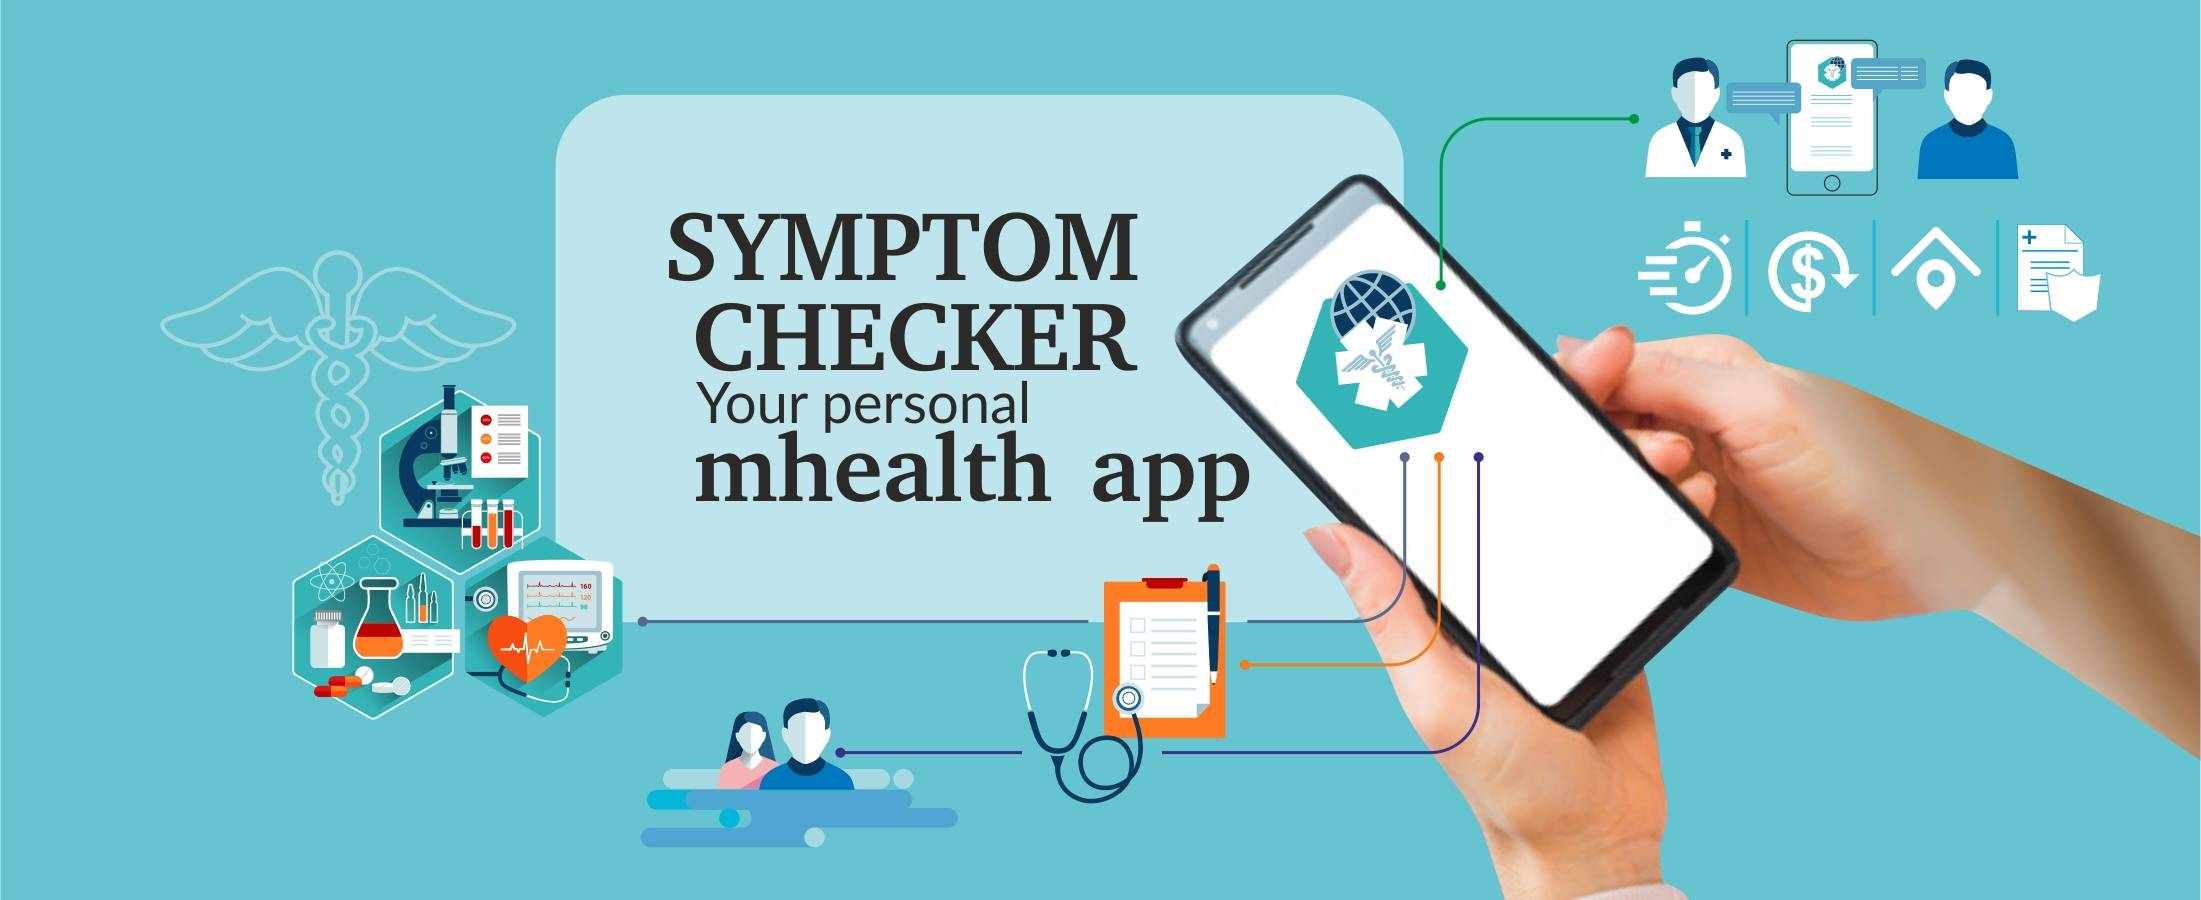 Mobifilia - Symptom Checker mHealth app